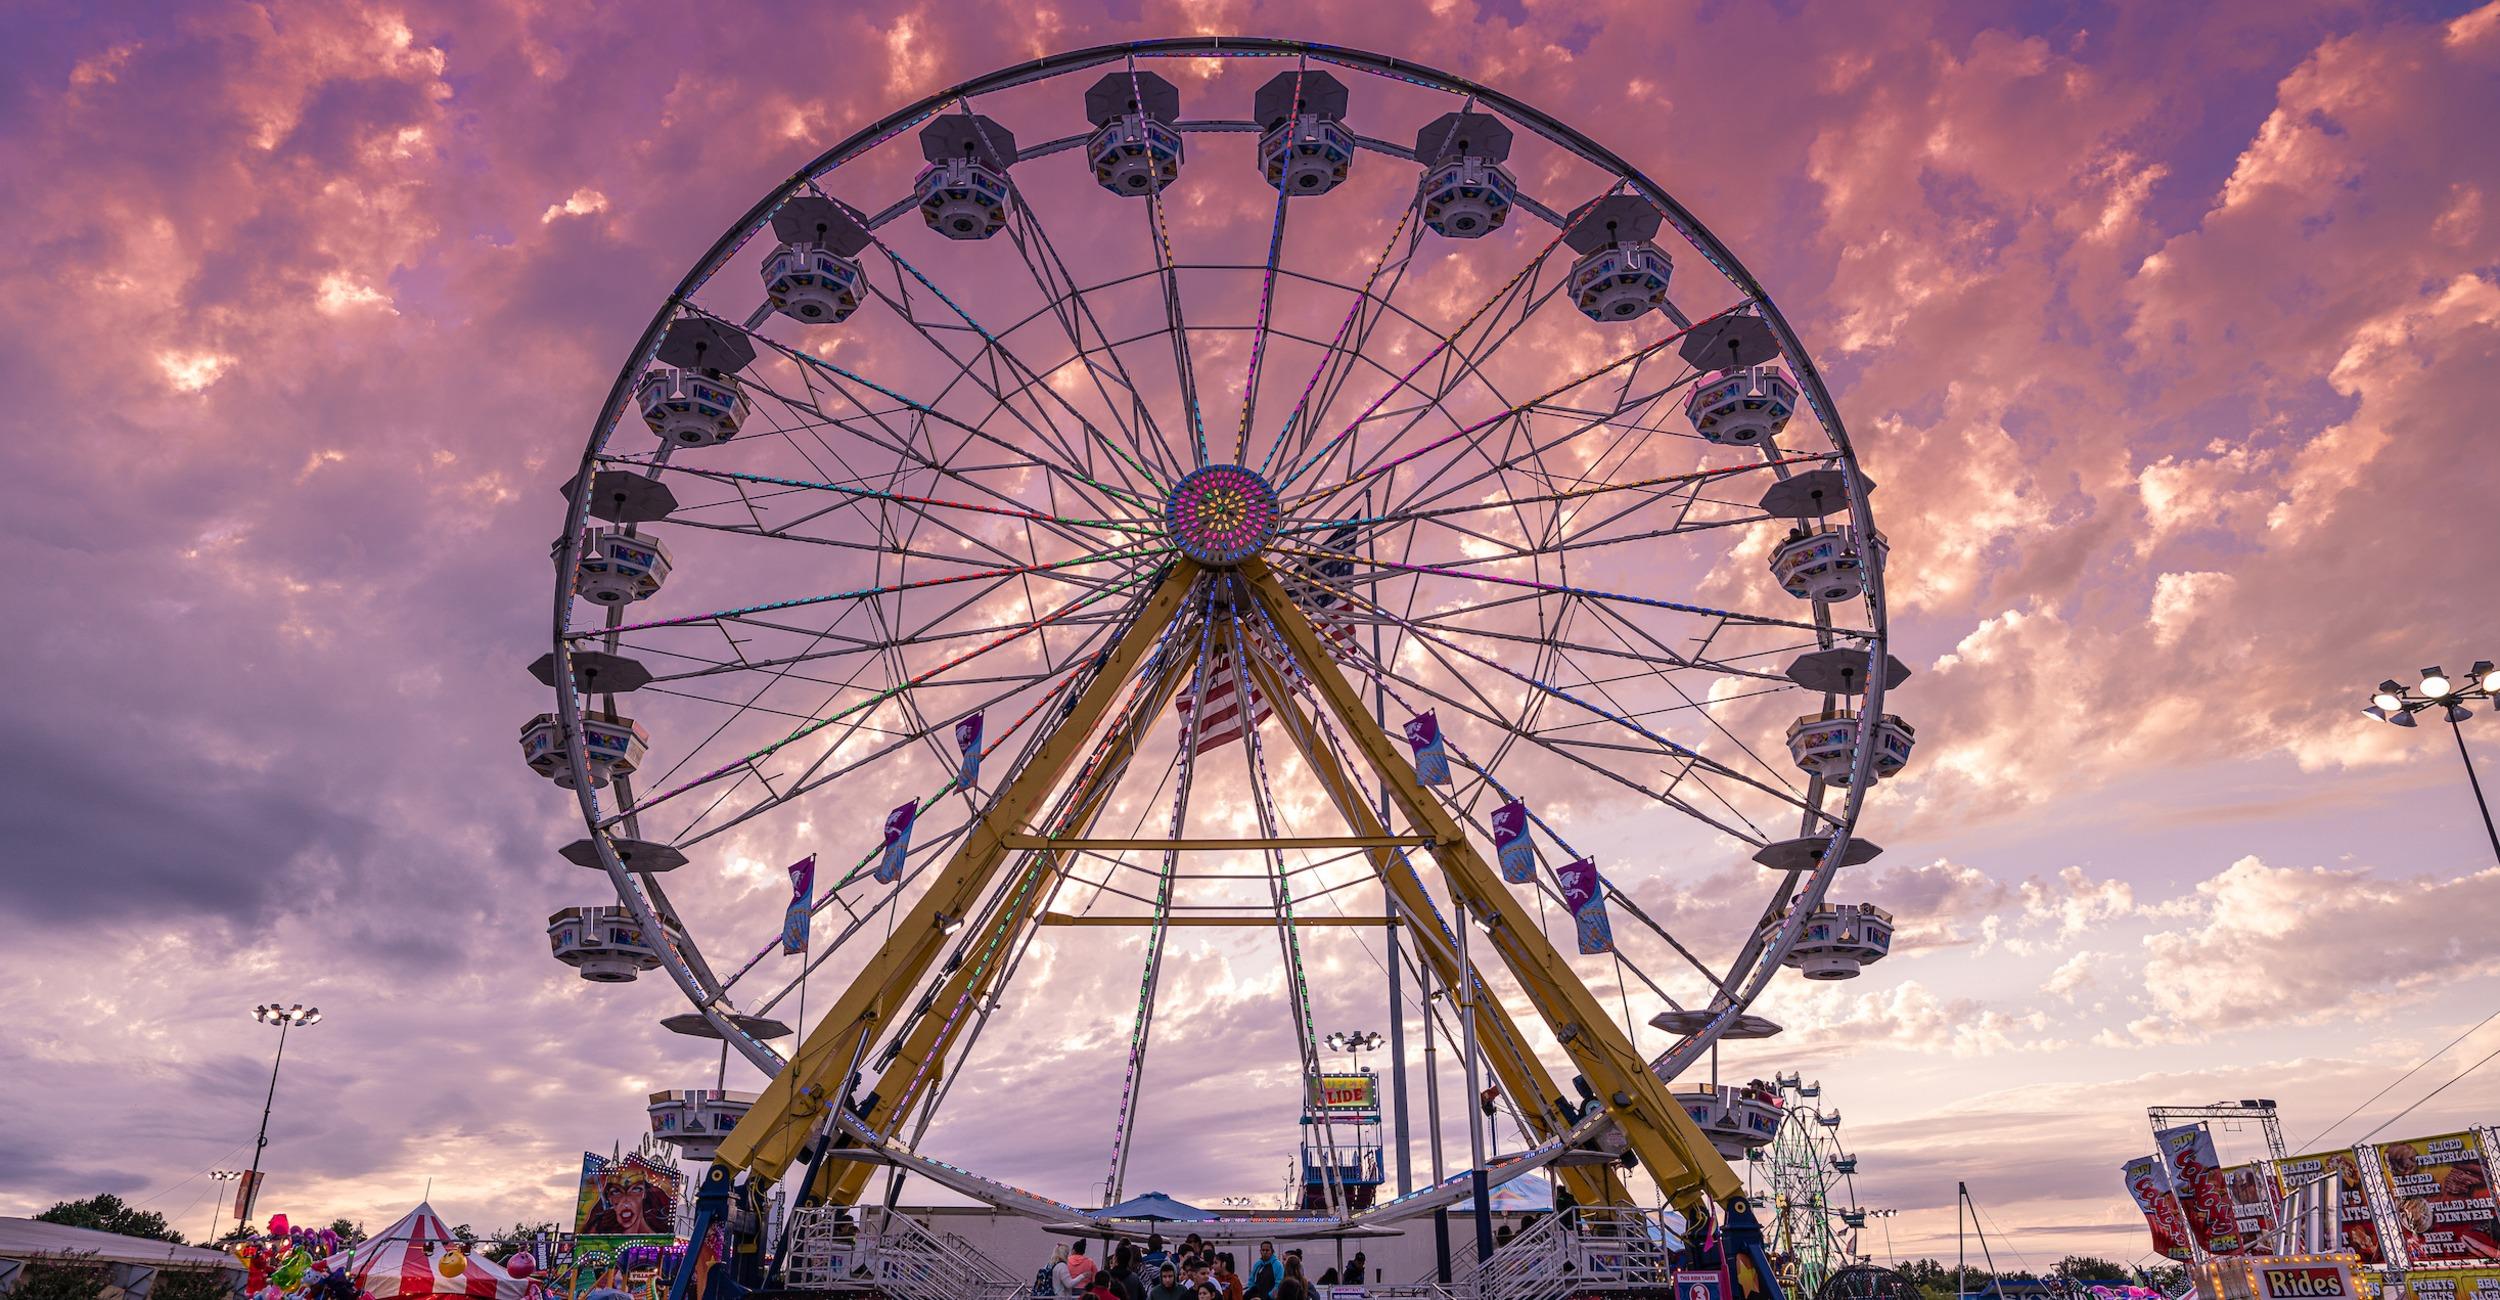 state fairs